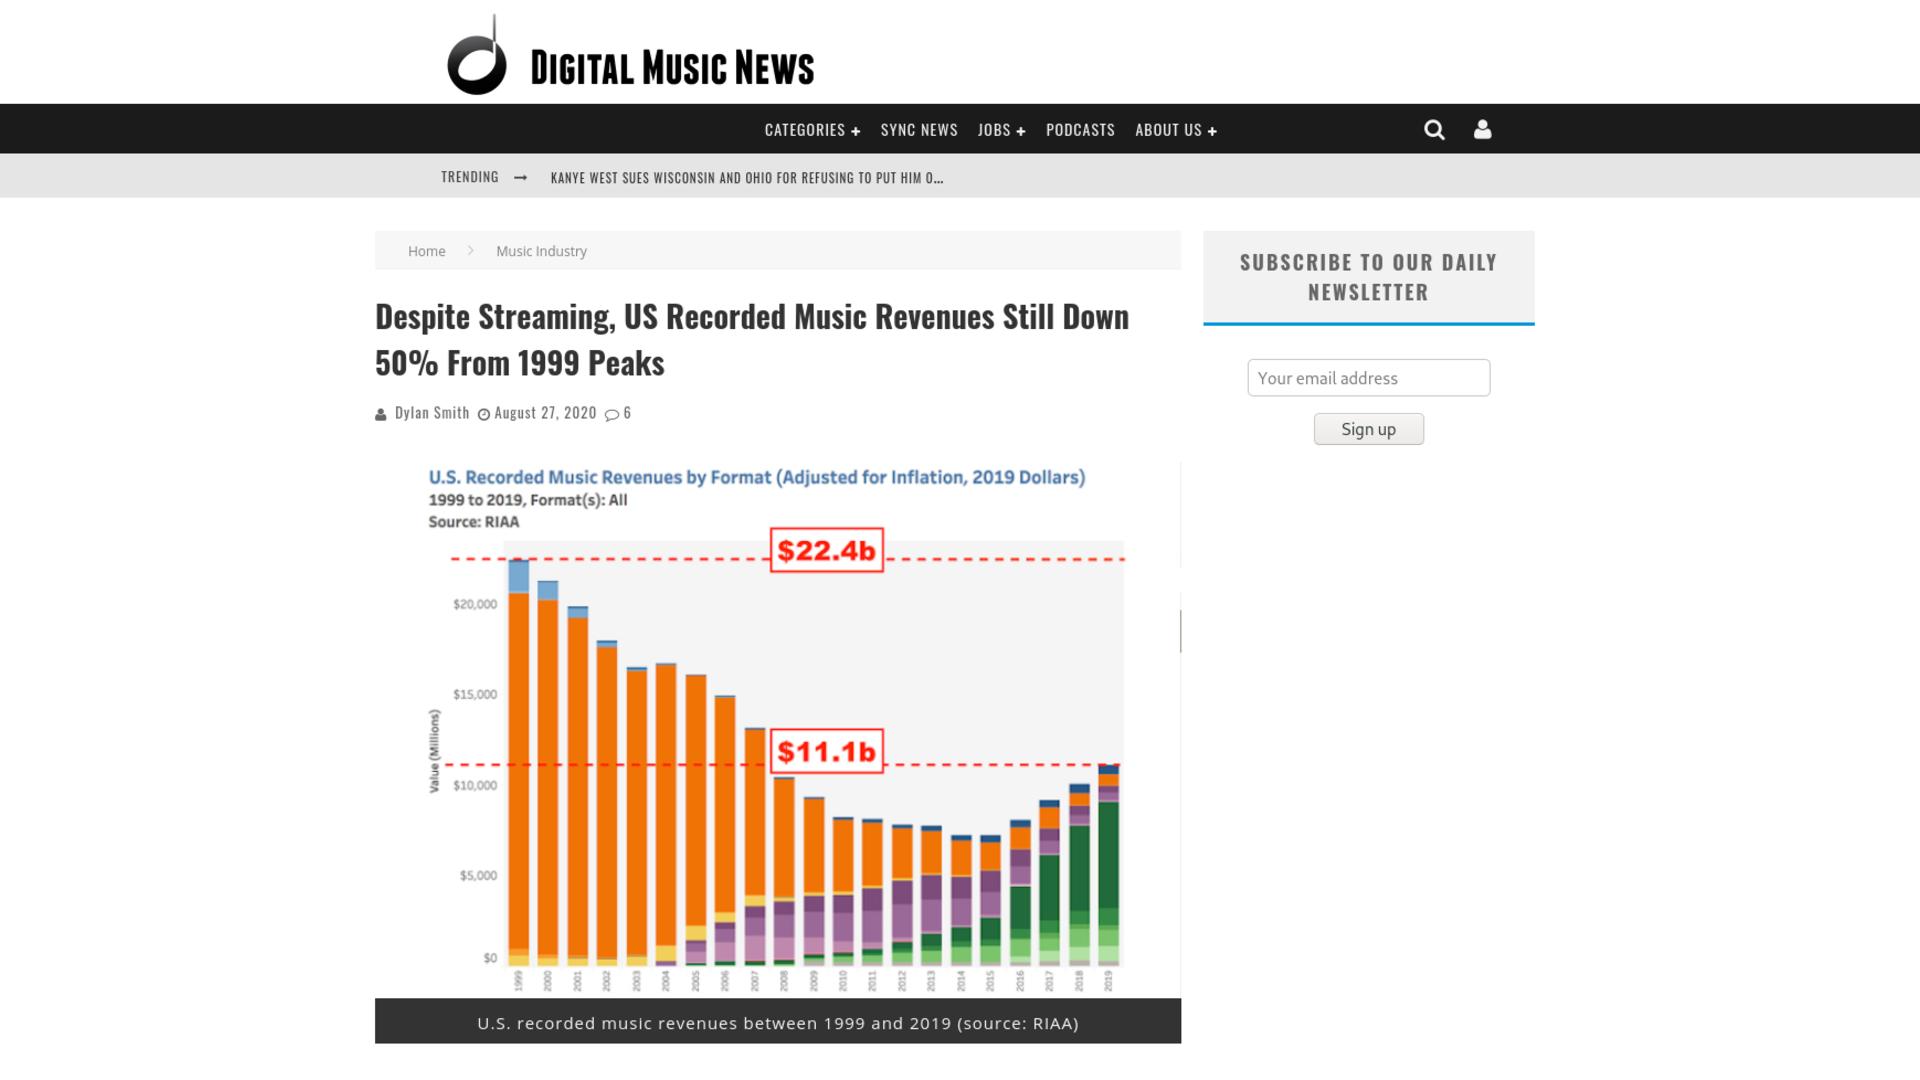 Fairness Rocks News Despite Streaming, US Recorded Music Revenues Still Down 50% From 1999 Peaks